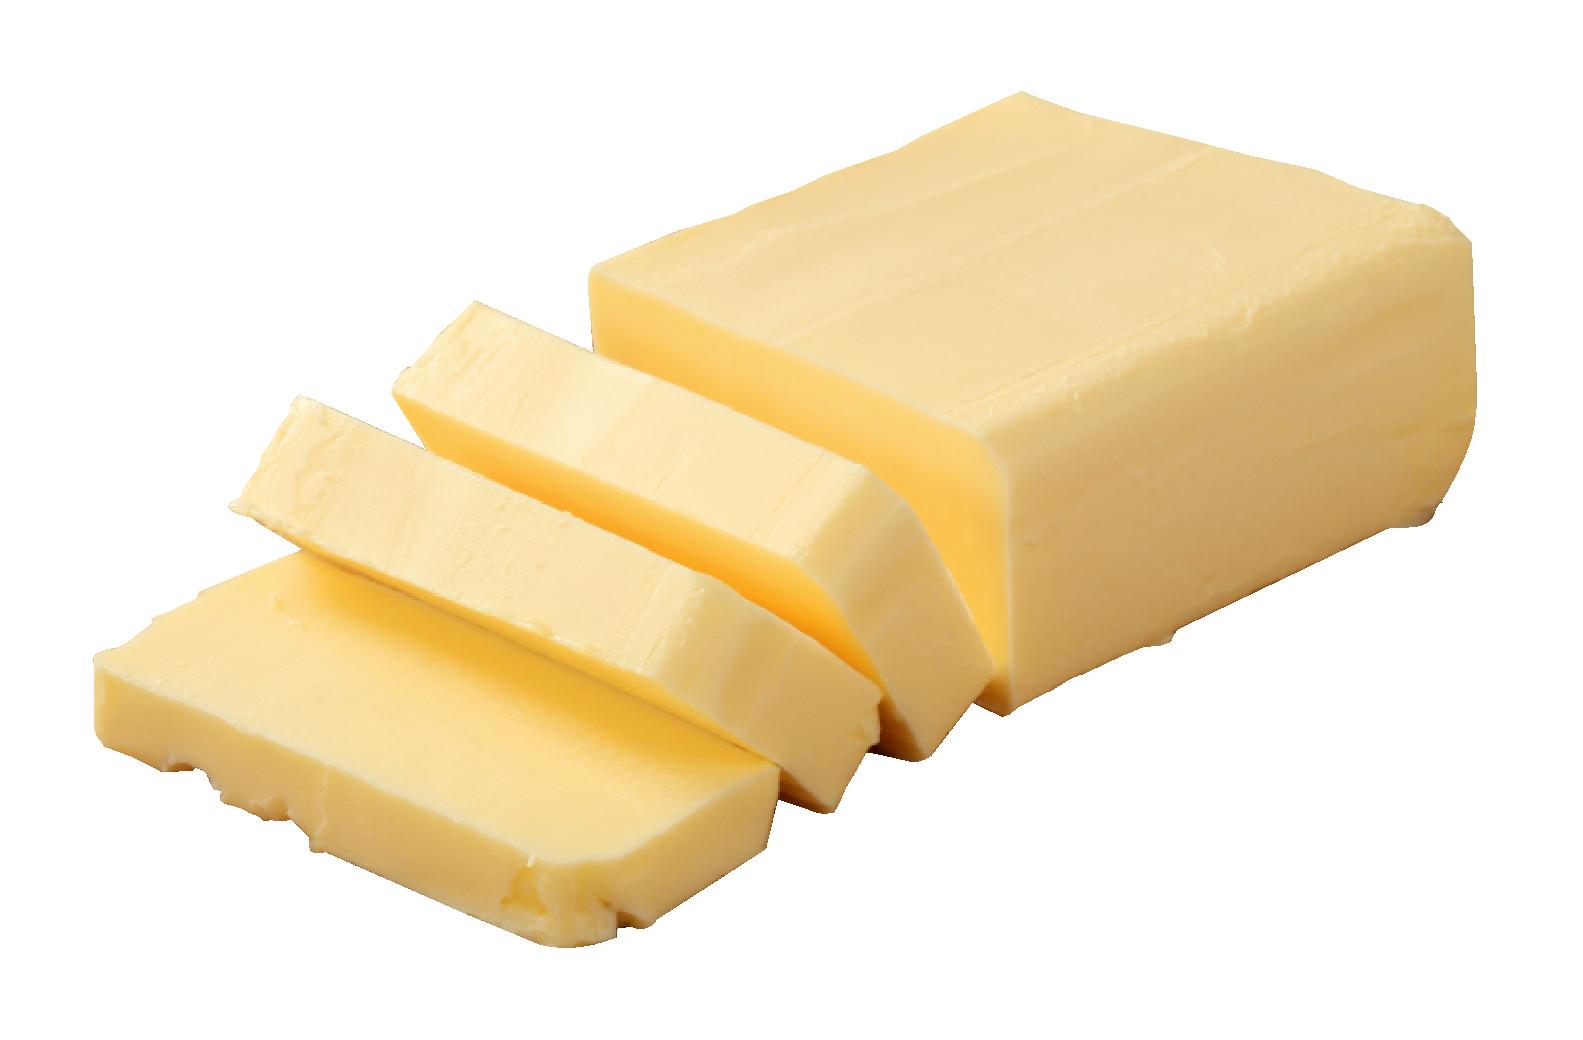 Butter clipart transparent Transparent PNG Butter image background